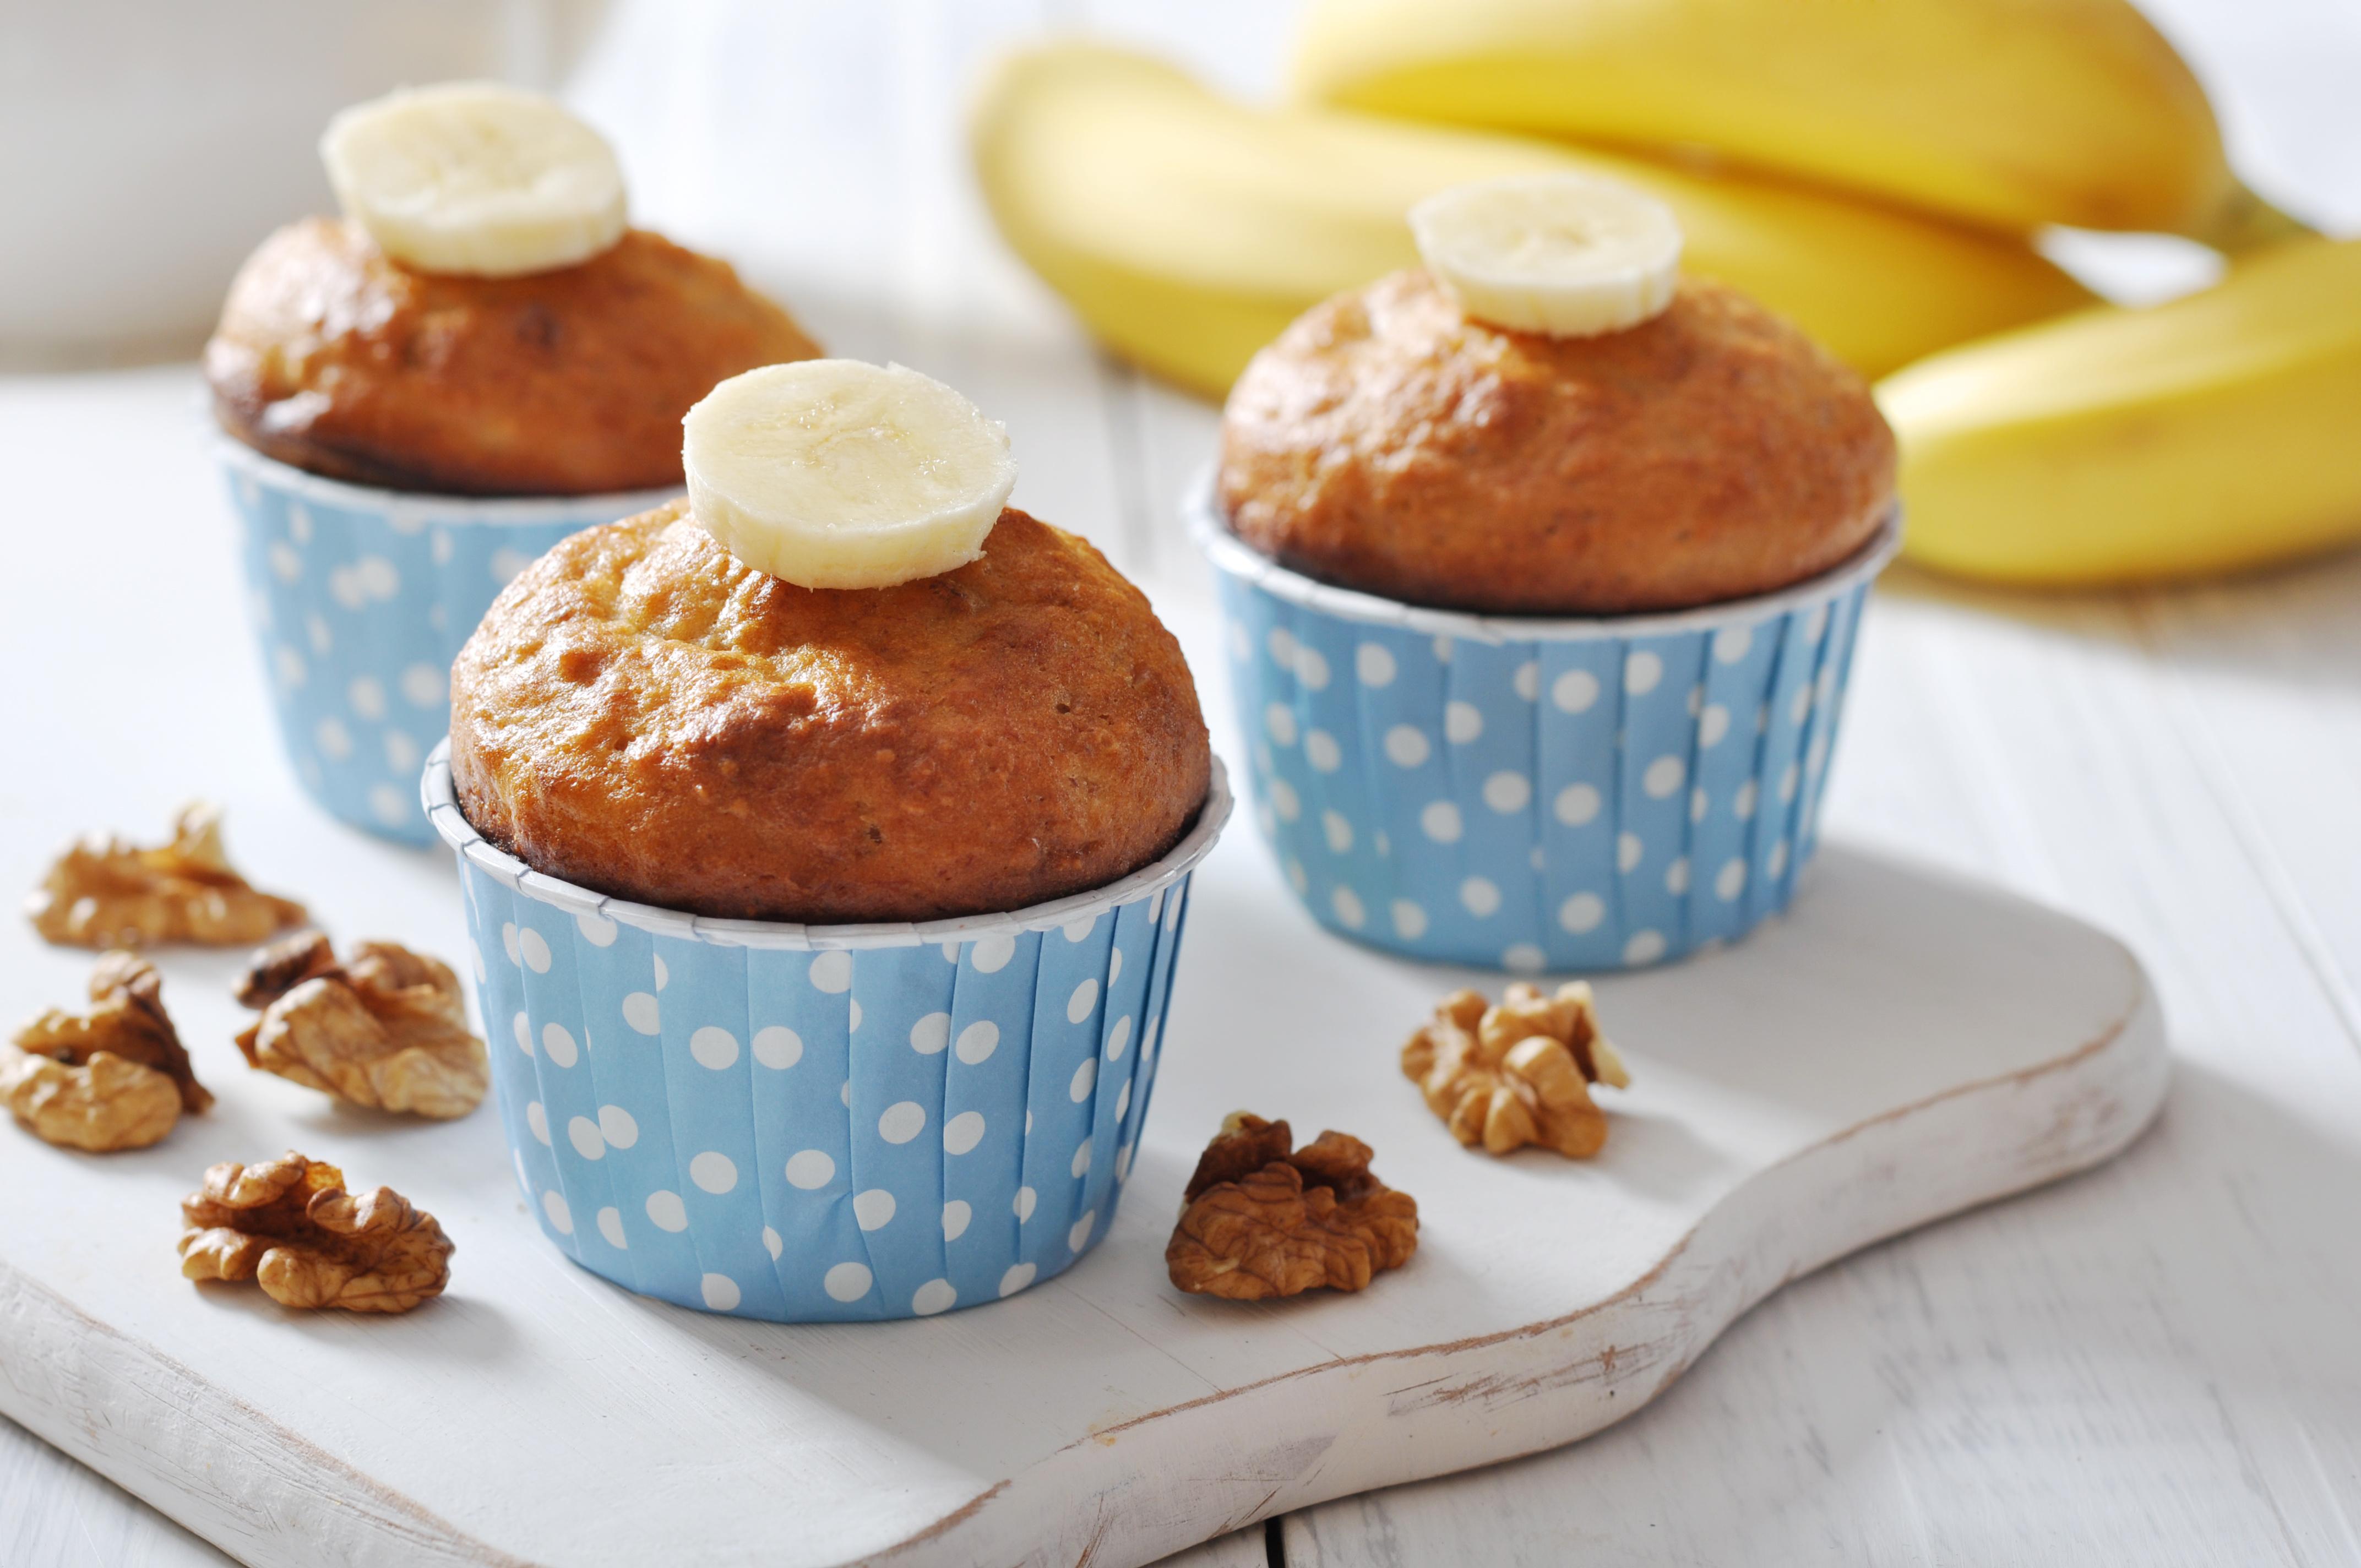 Bananen Walnuss Muffins